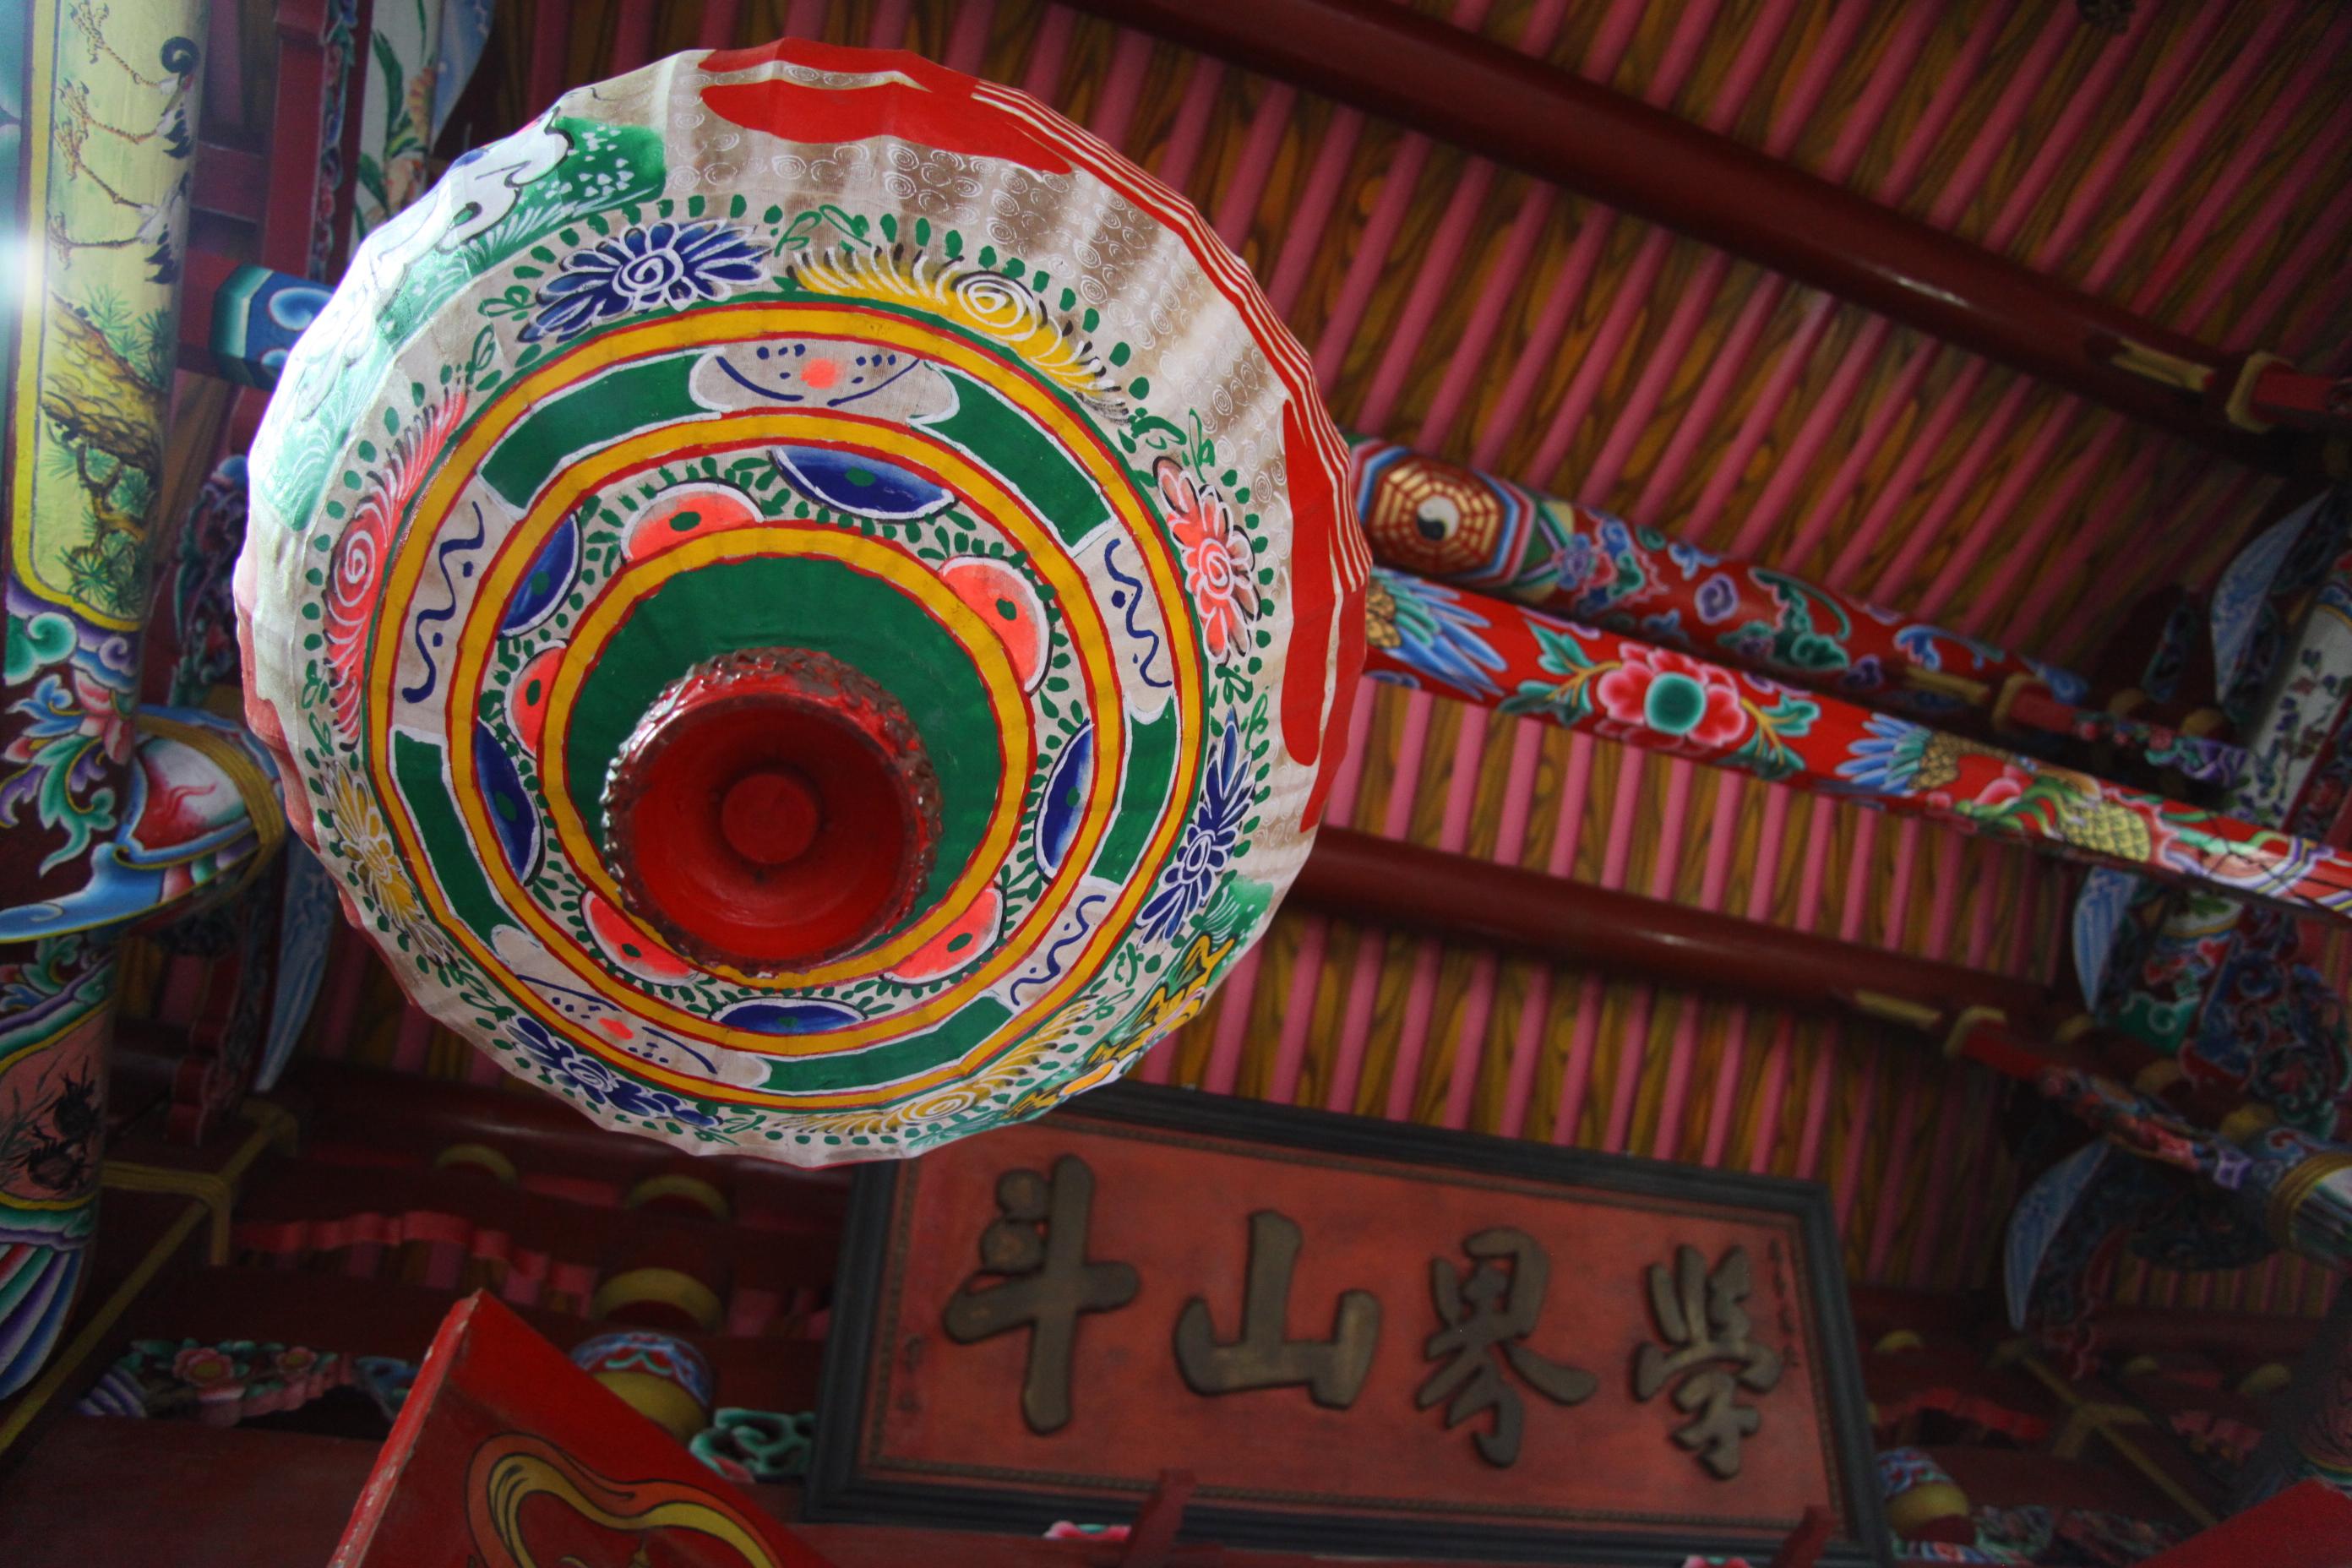 File:新竹鄭氏家廟 (48).JPG - Wikimedia Commons